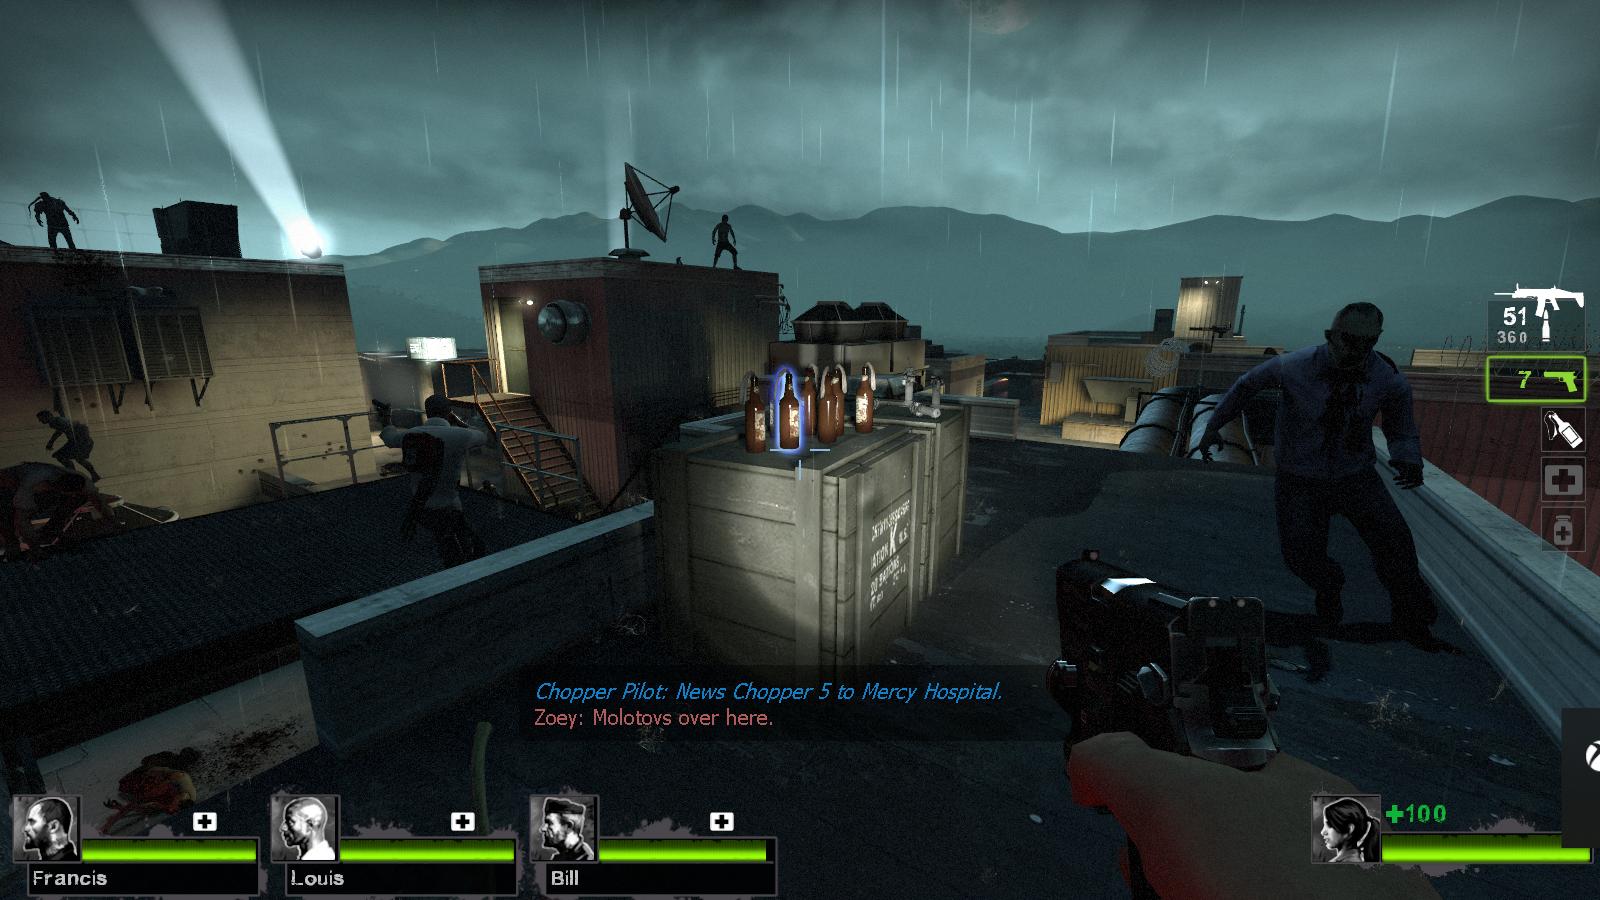 Game Review: Left 4 Dead & Comparison to Left 4 Dead 2 - Written By